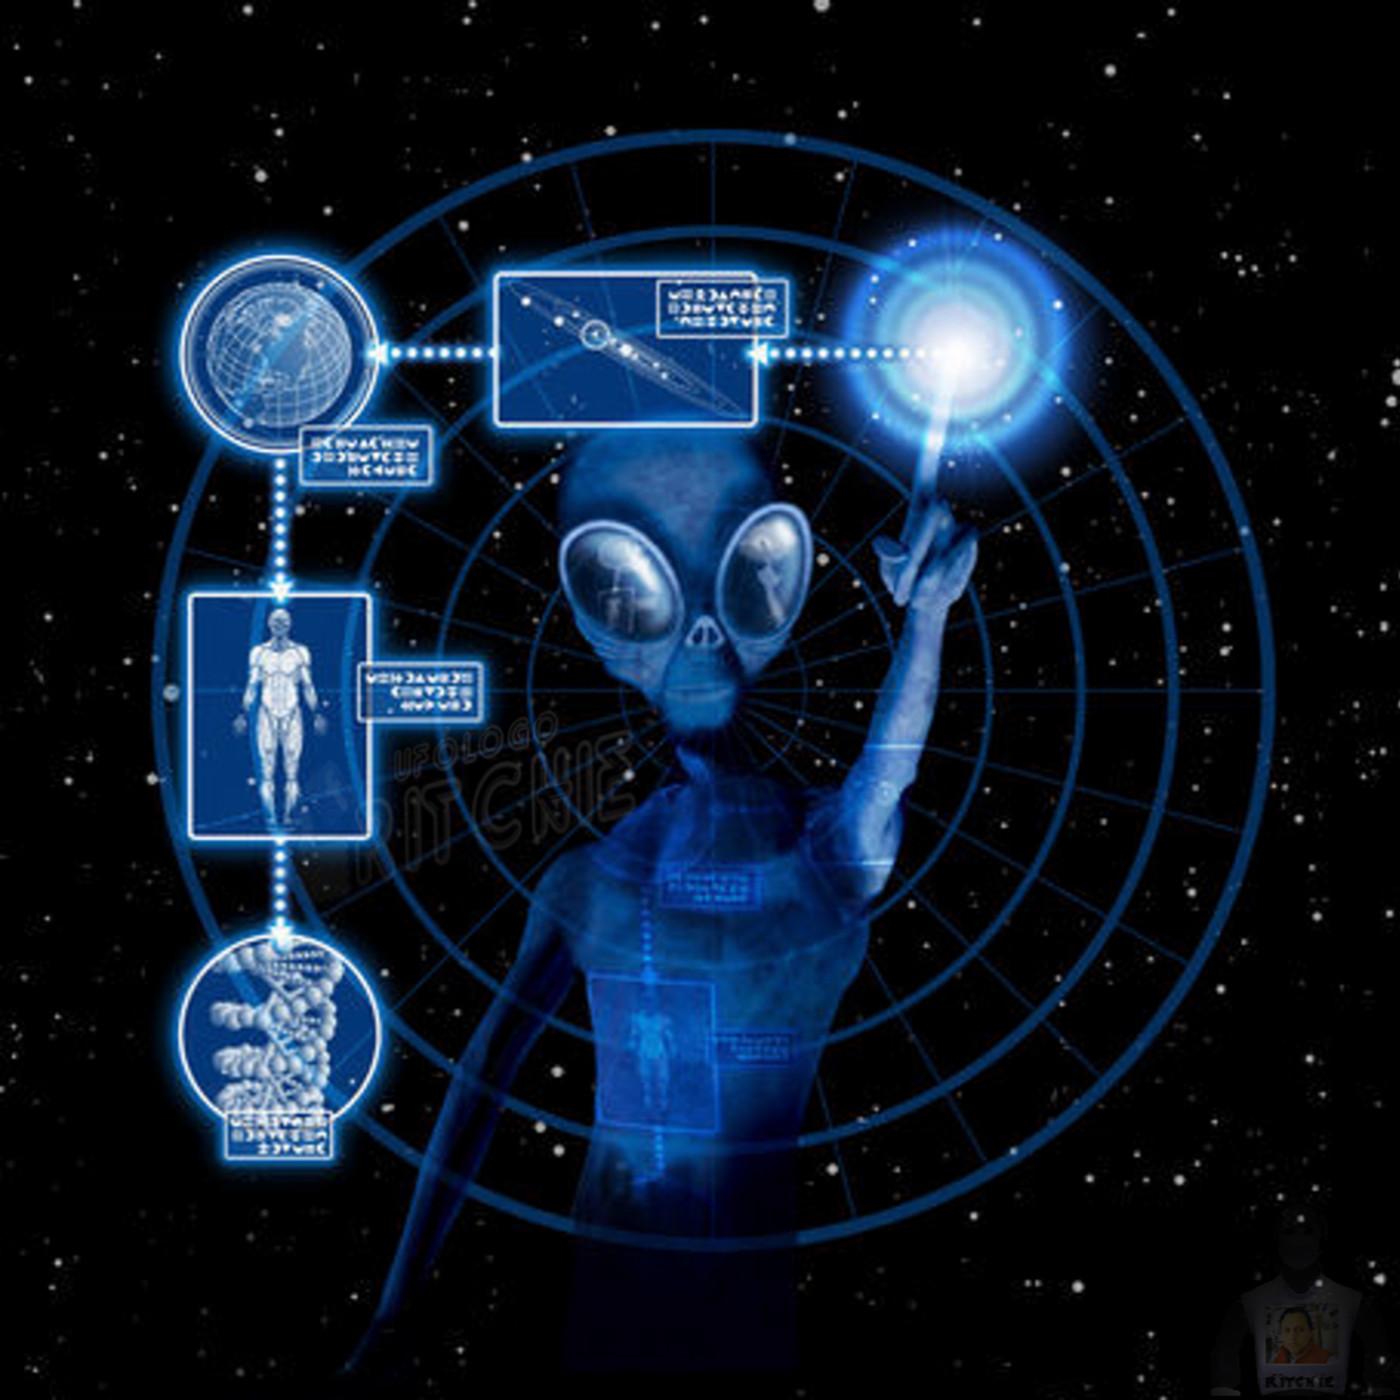 Ovnis: Tecnología Alienígena Secreta #ciencia #documental #podcast